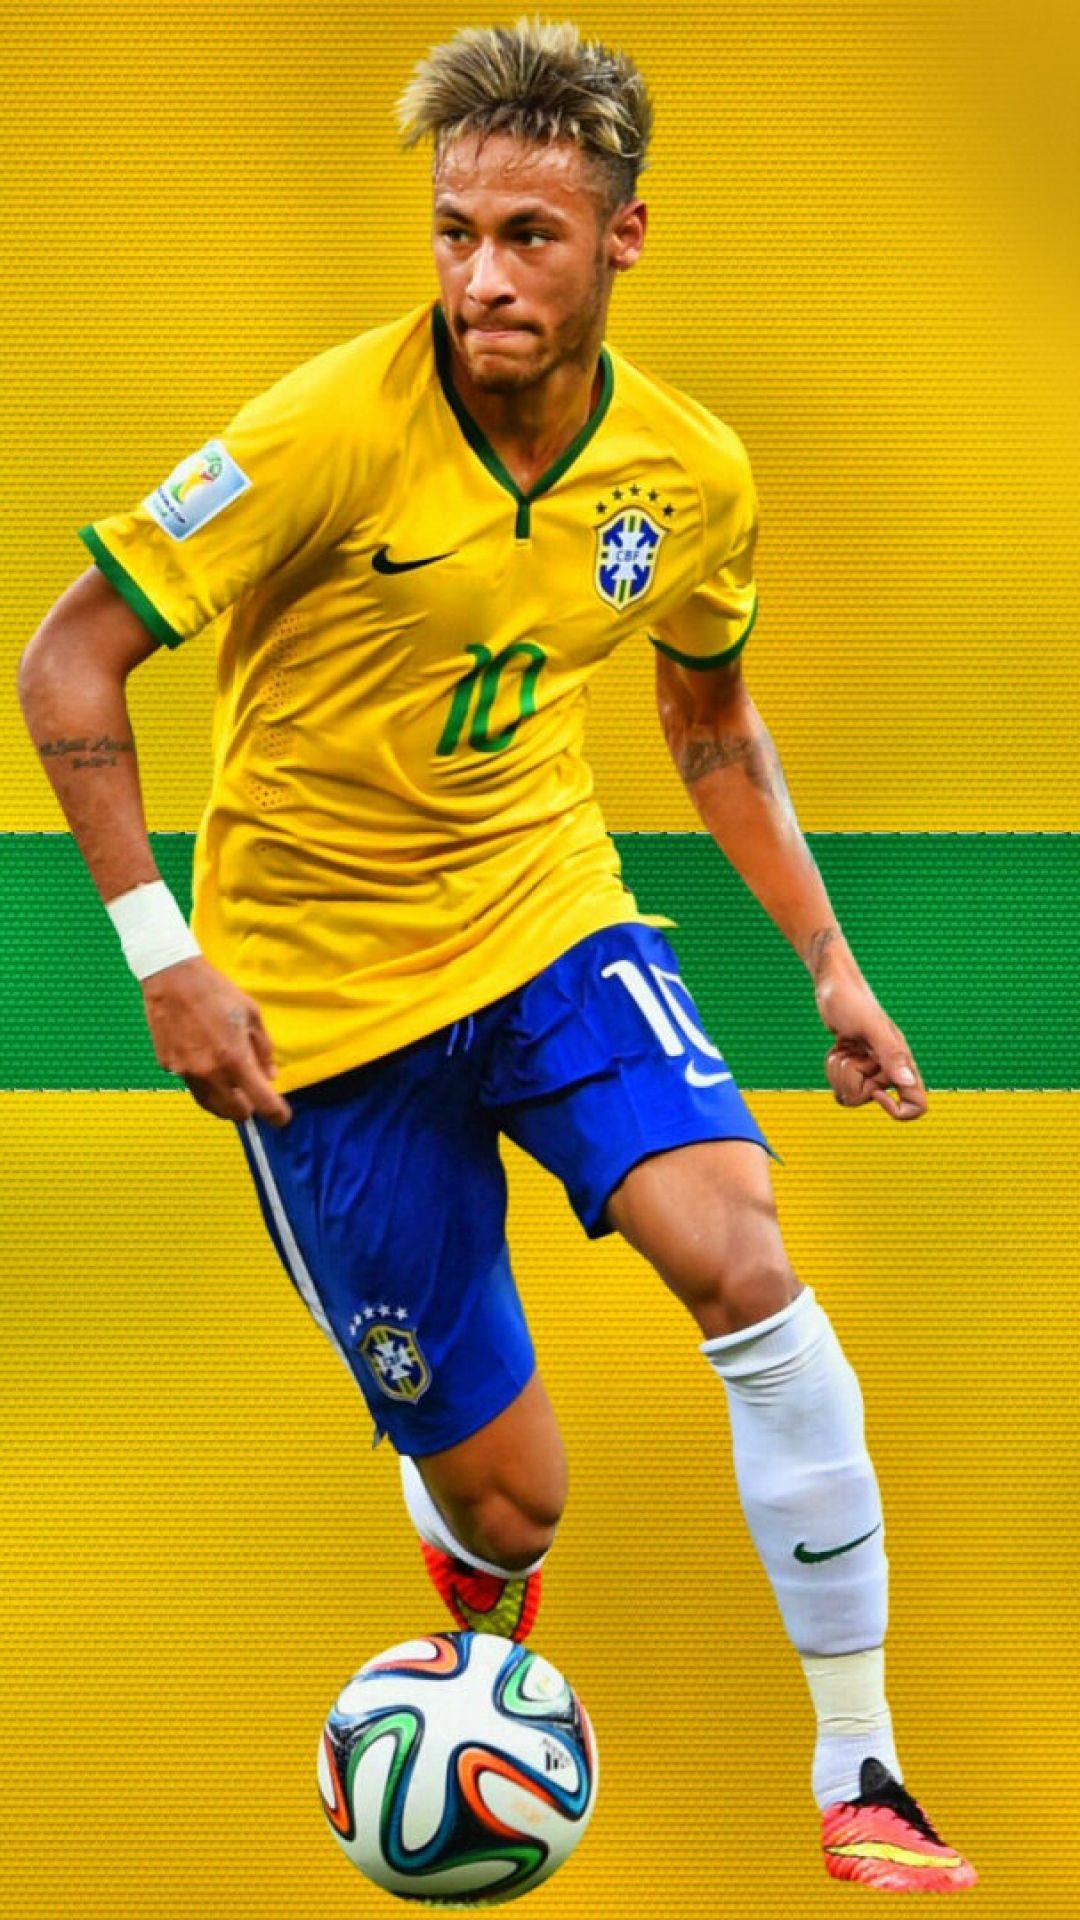 Neymar Jr HD iPhone Wallpapers - Wallpaper Cave